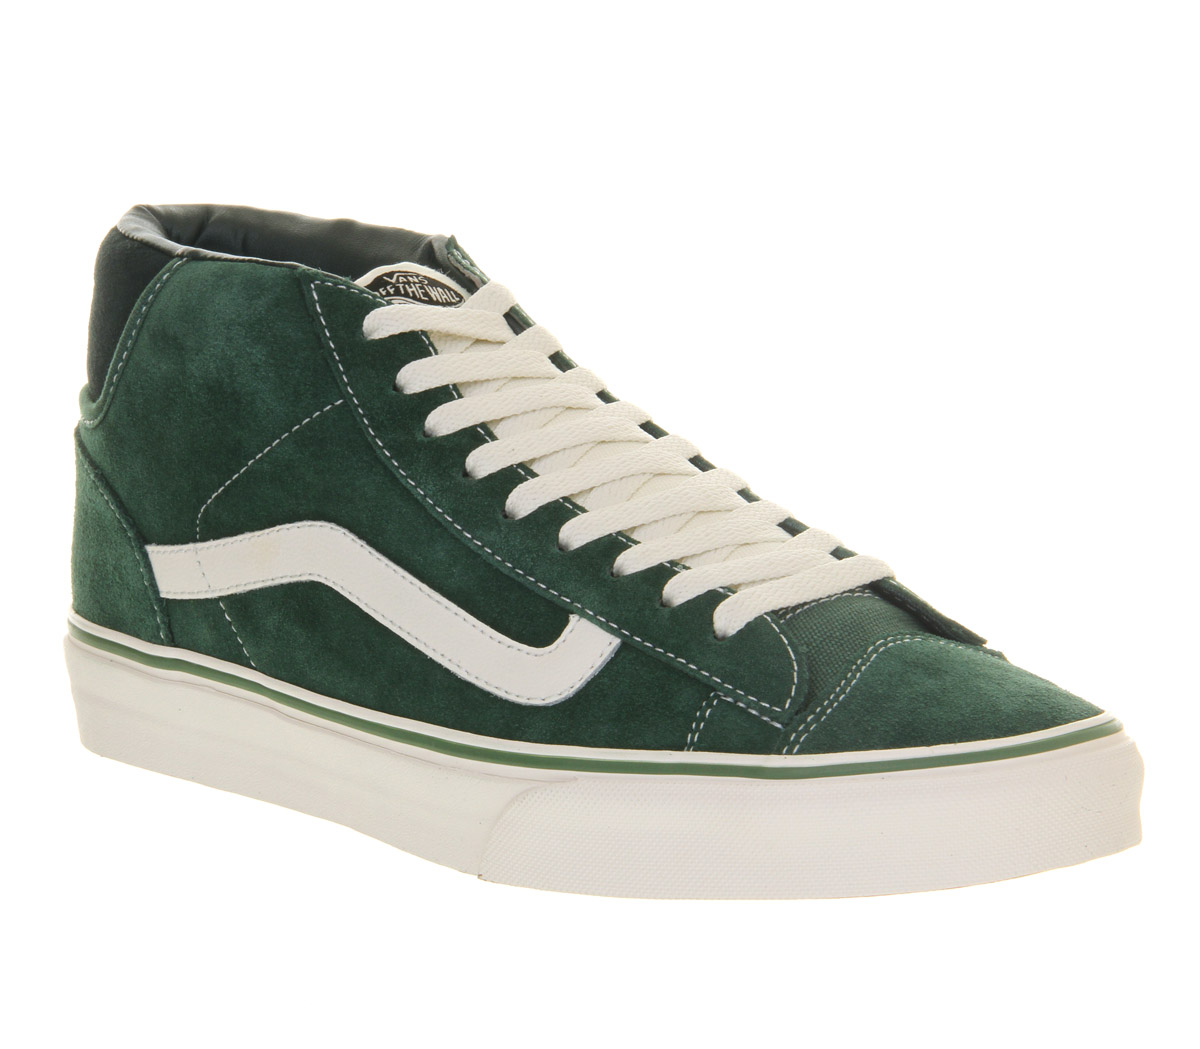 e338a452c9 Lyst - Vans Mid Skool 77 in Green for Men